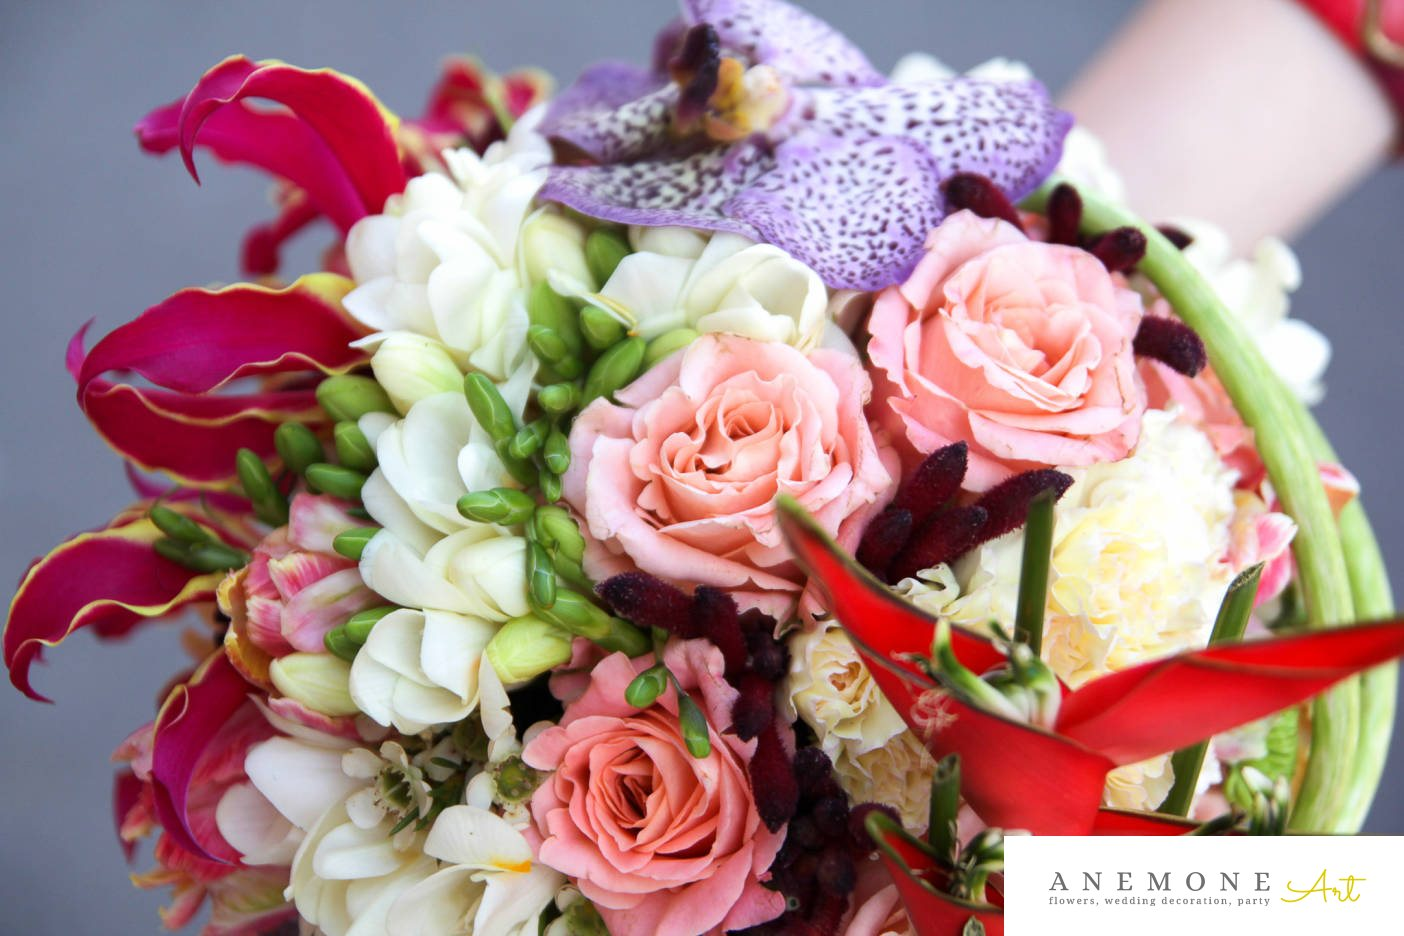 Poza, foto cu Flori de nunta buchet mireasa, calla, frezii, lisianthus, orhidee in Arad, Timisoara, Oradea (wedding flowers, bouquets) nunta Arad, Timisoara, Oradea